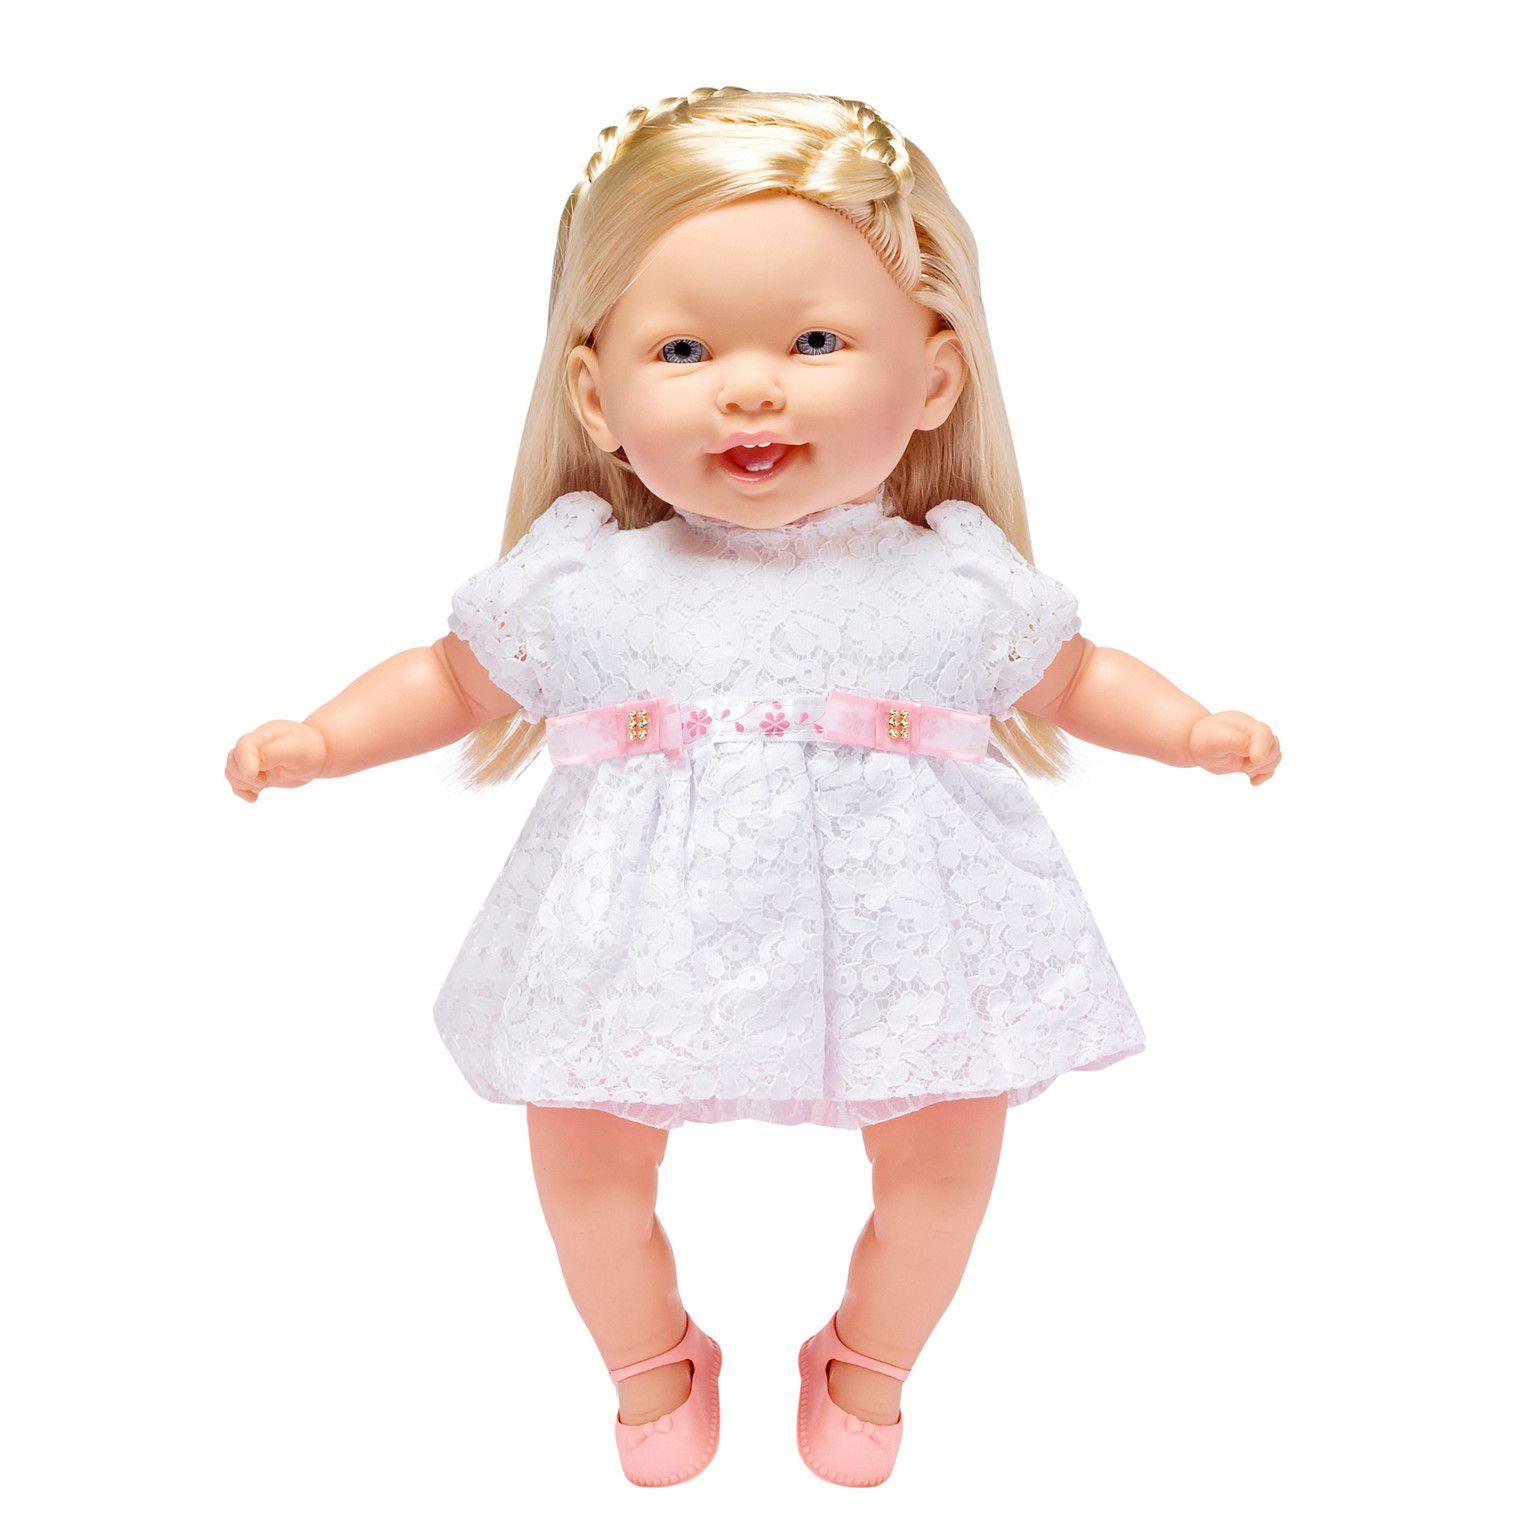 BONECA COTIPLAS CHECK-UP BABY REF:2076